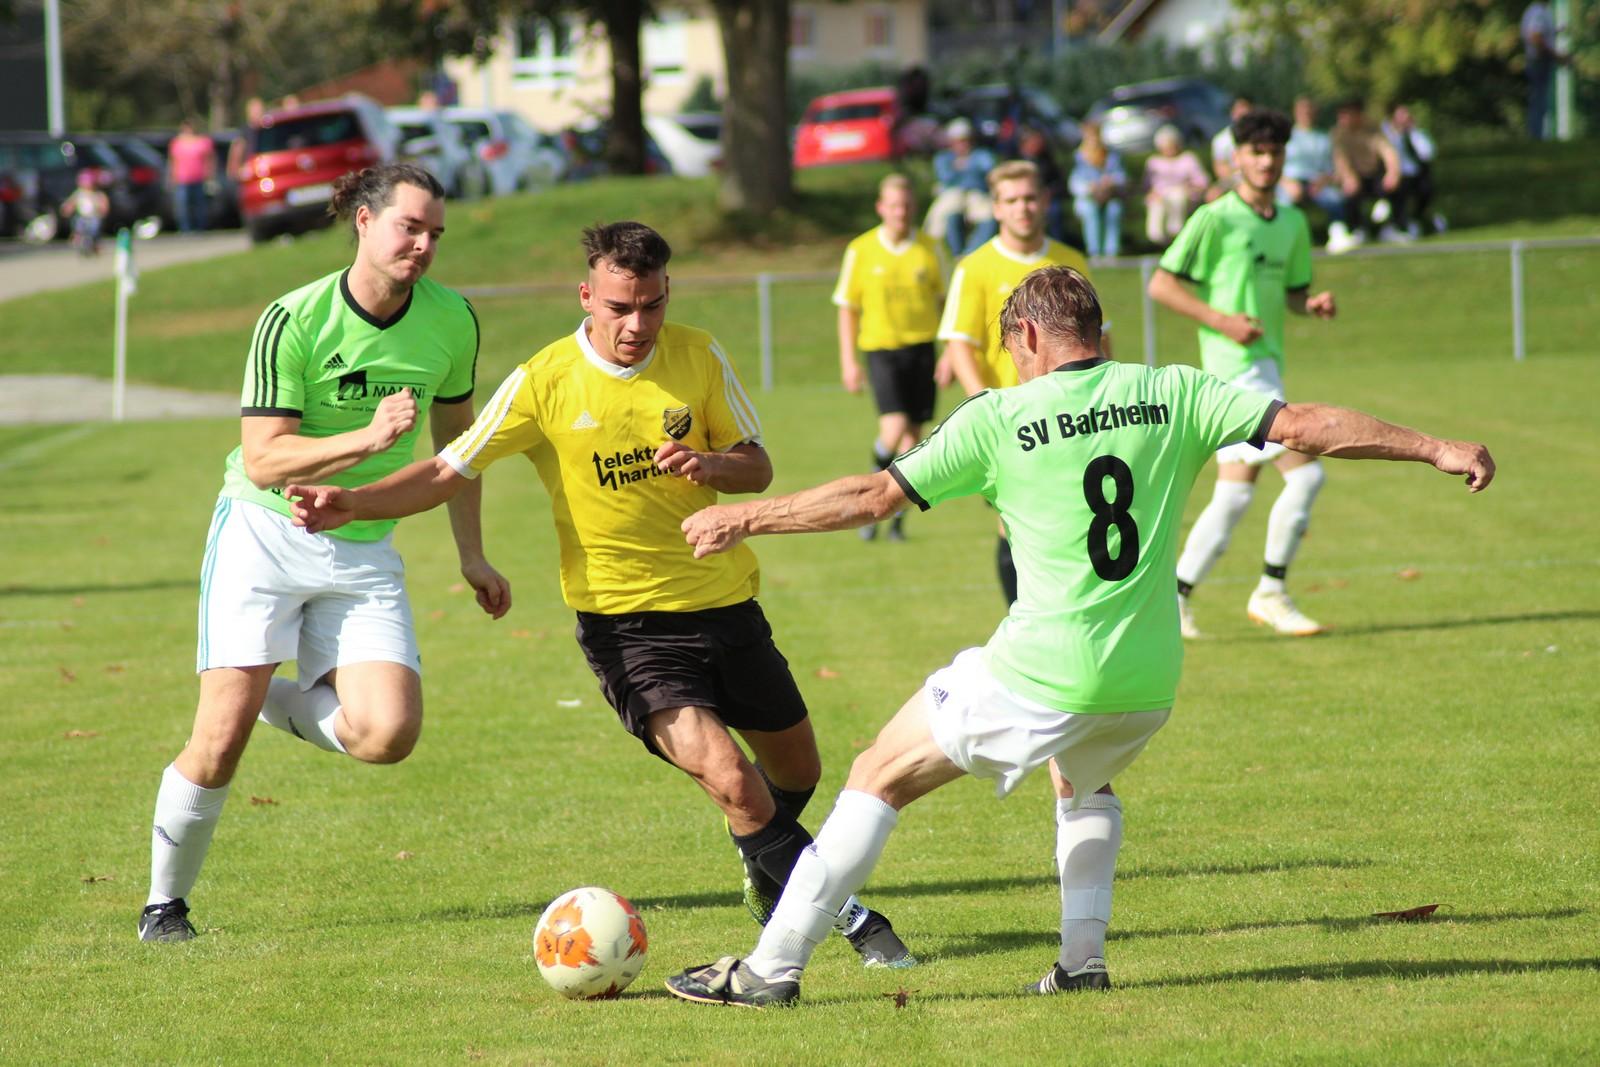 03.10.2021: SV Balzheim II - SV Beuren II